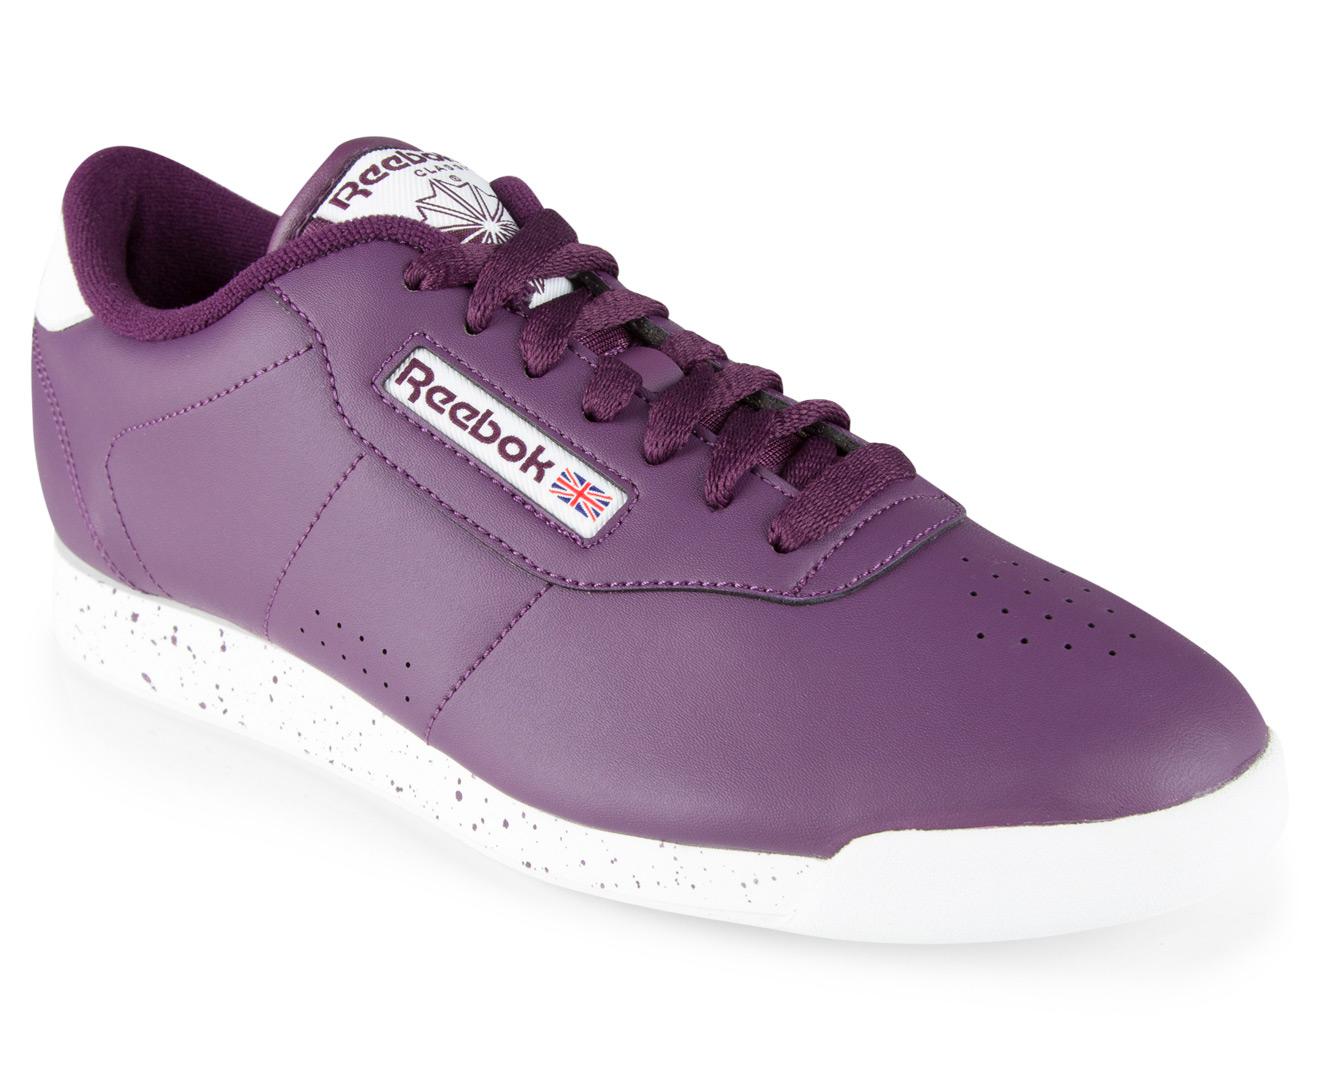 Reebok Princess White Shoes Australia